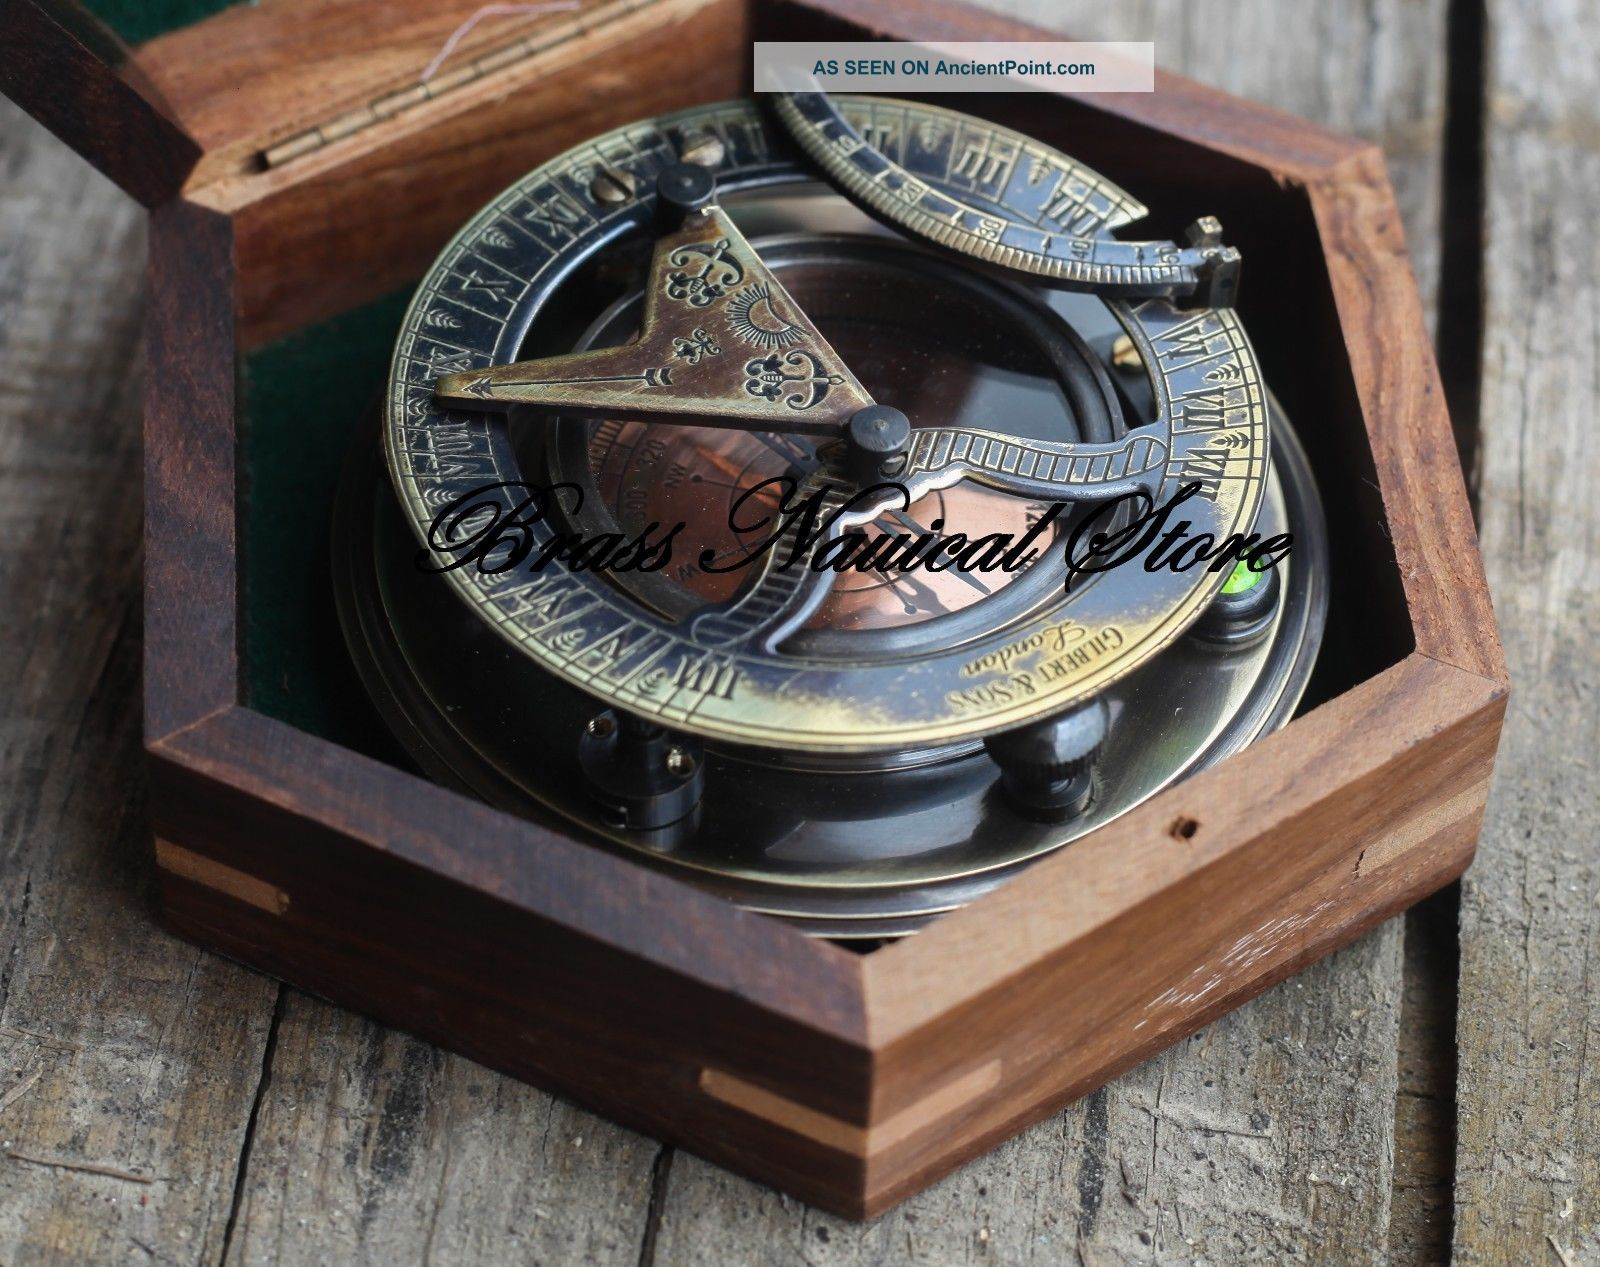 Antique London Antique Brass Sundial Compass Nautical Compass Decor Gift Unisex Compasses photo